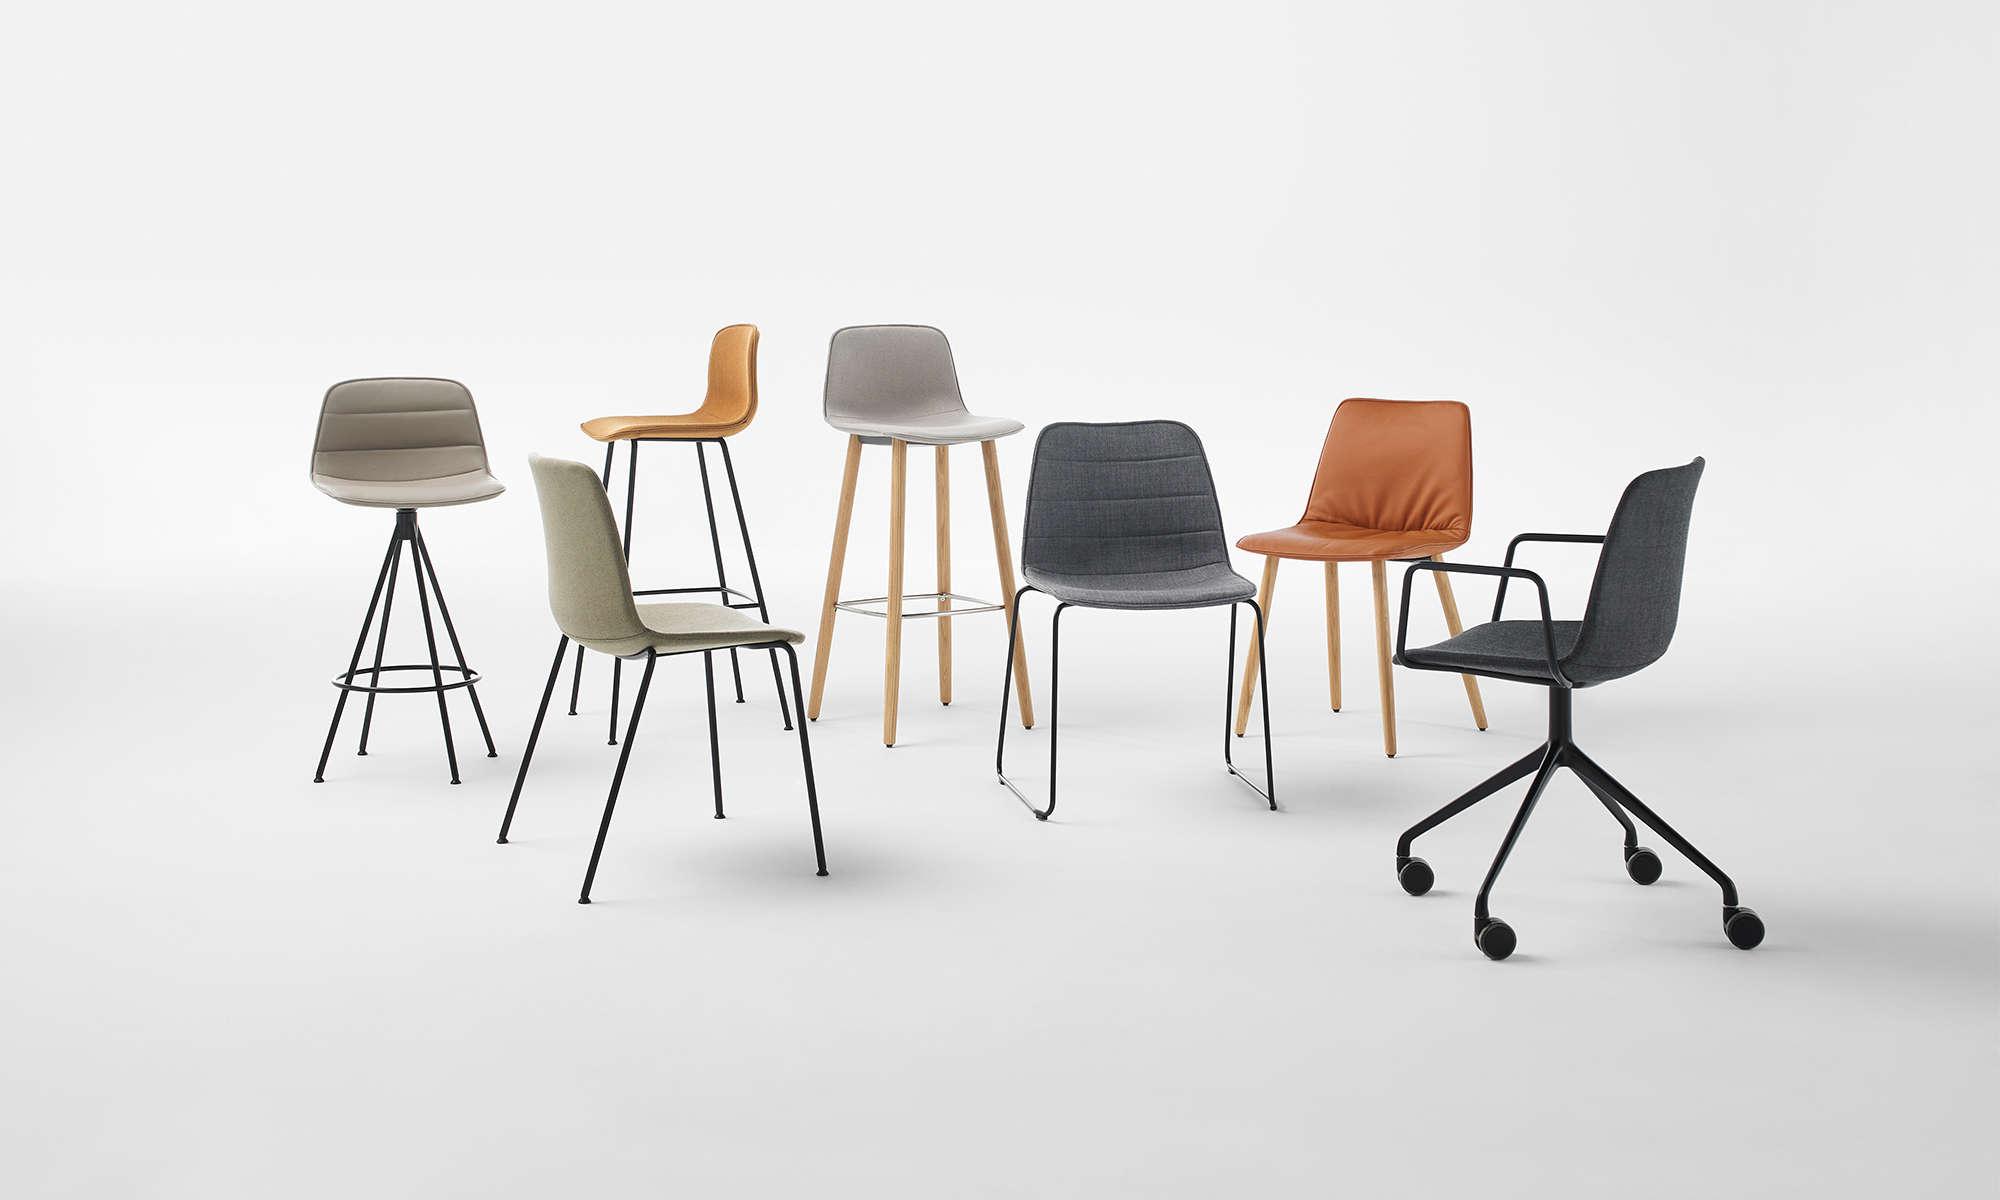 European, Inclass Varya, commercial seating options